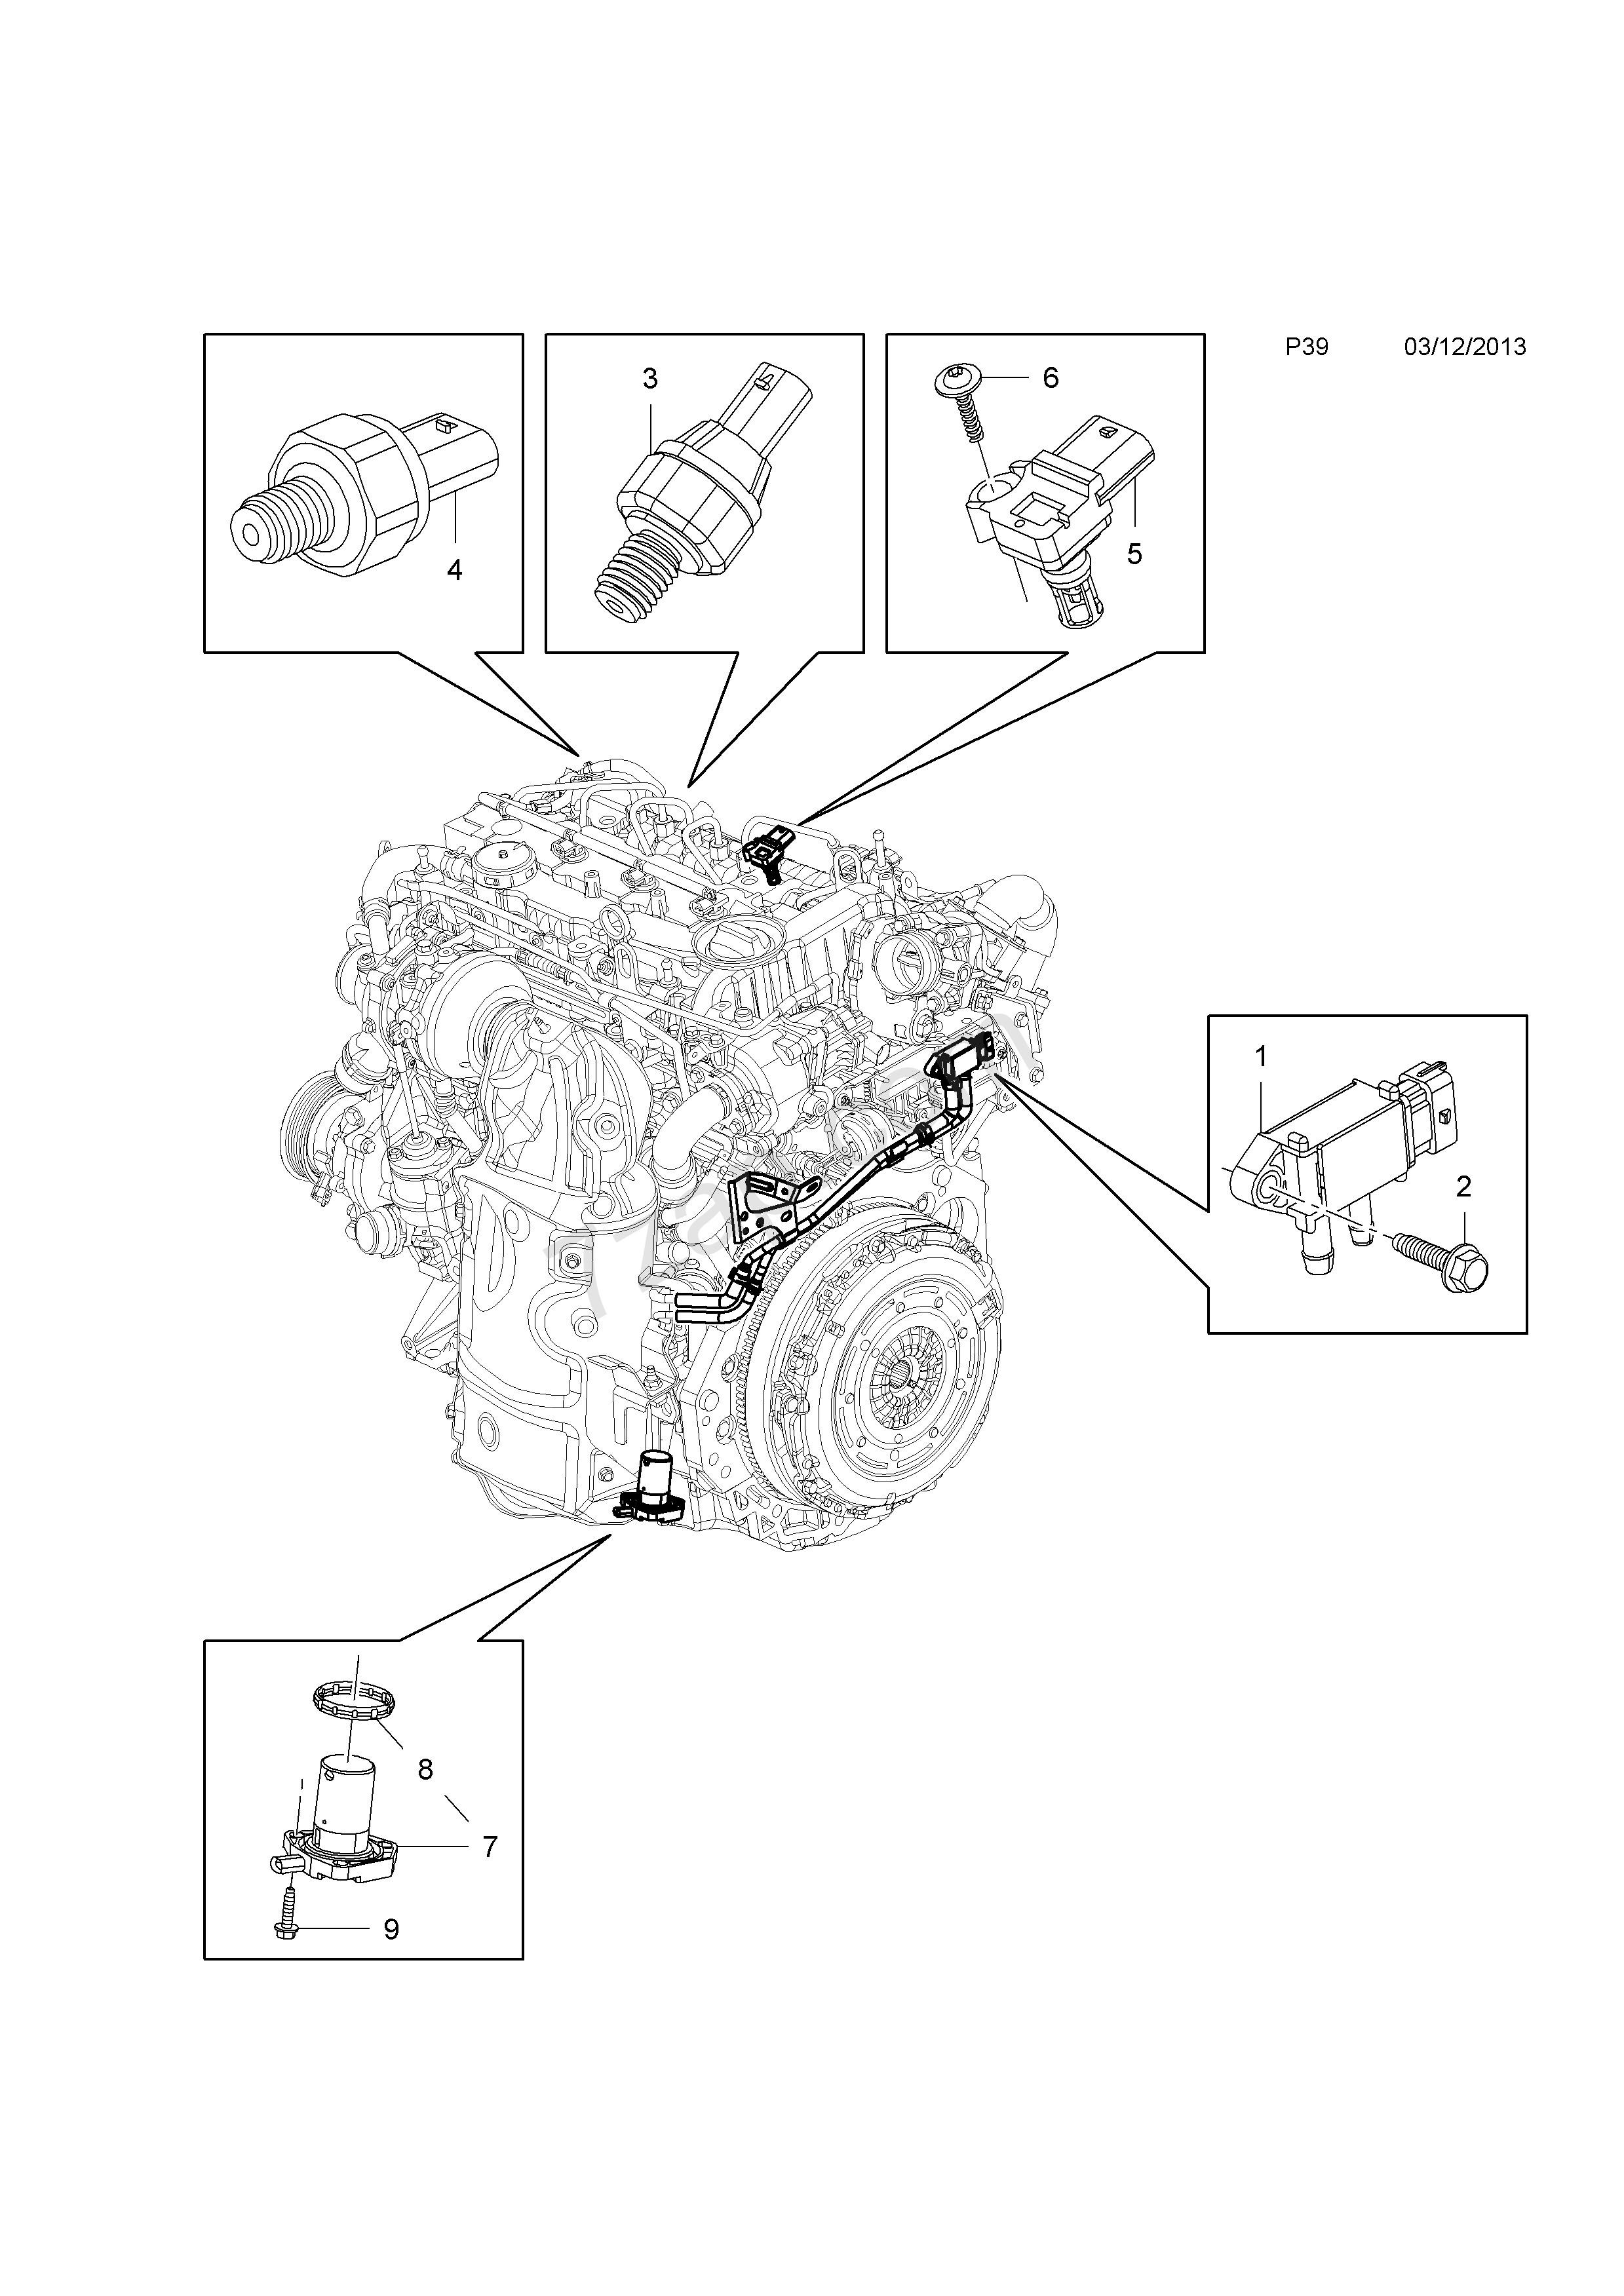 Car Powertrain Diagram Powertrain Sensors and Engine Control Module [oil Pressure Switch Of Car Powertrain Diagram